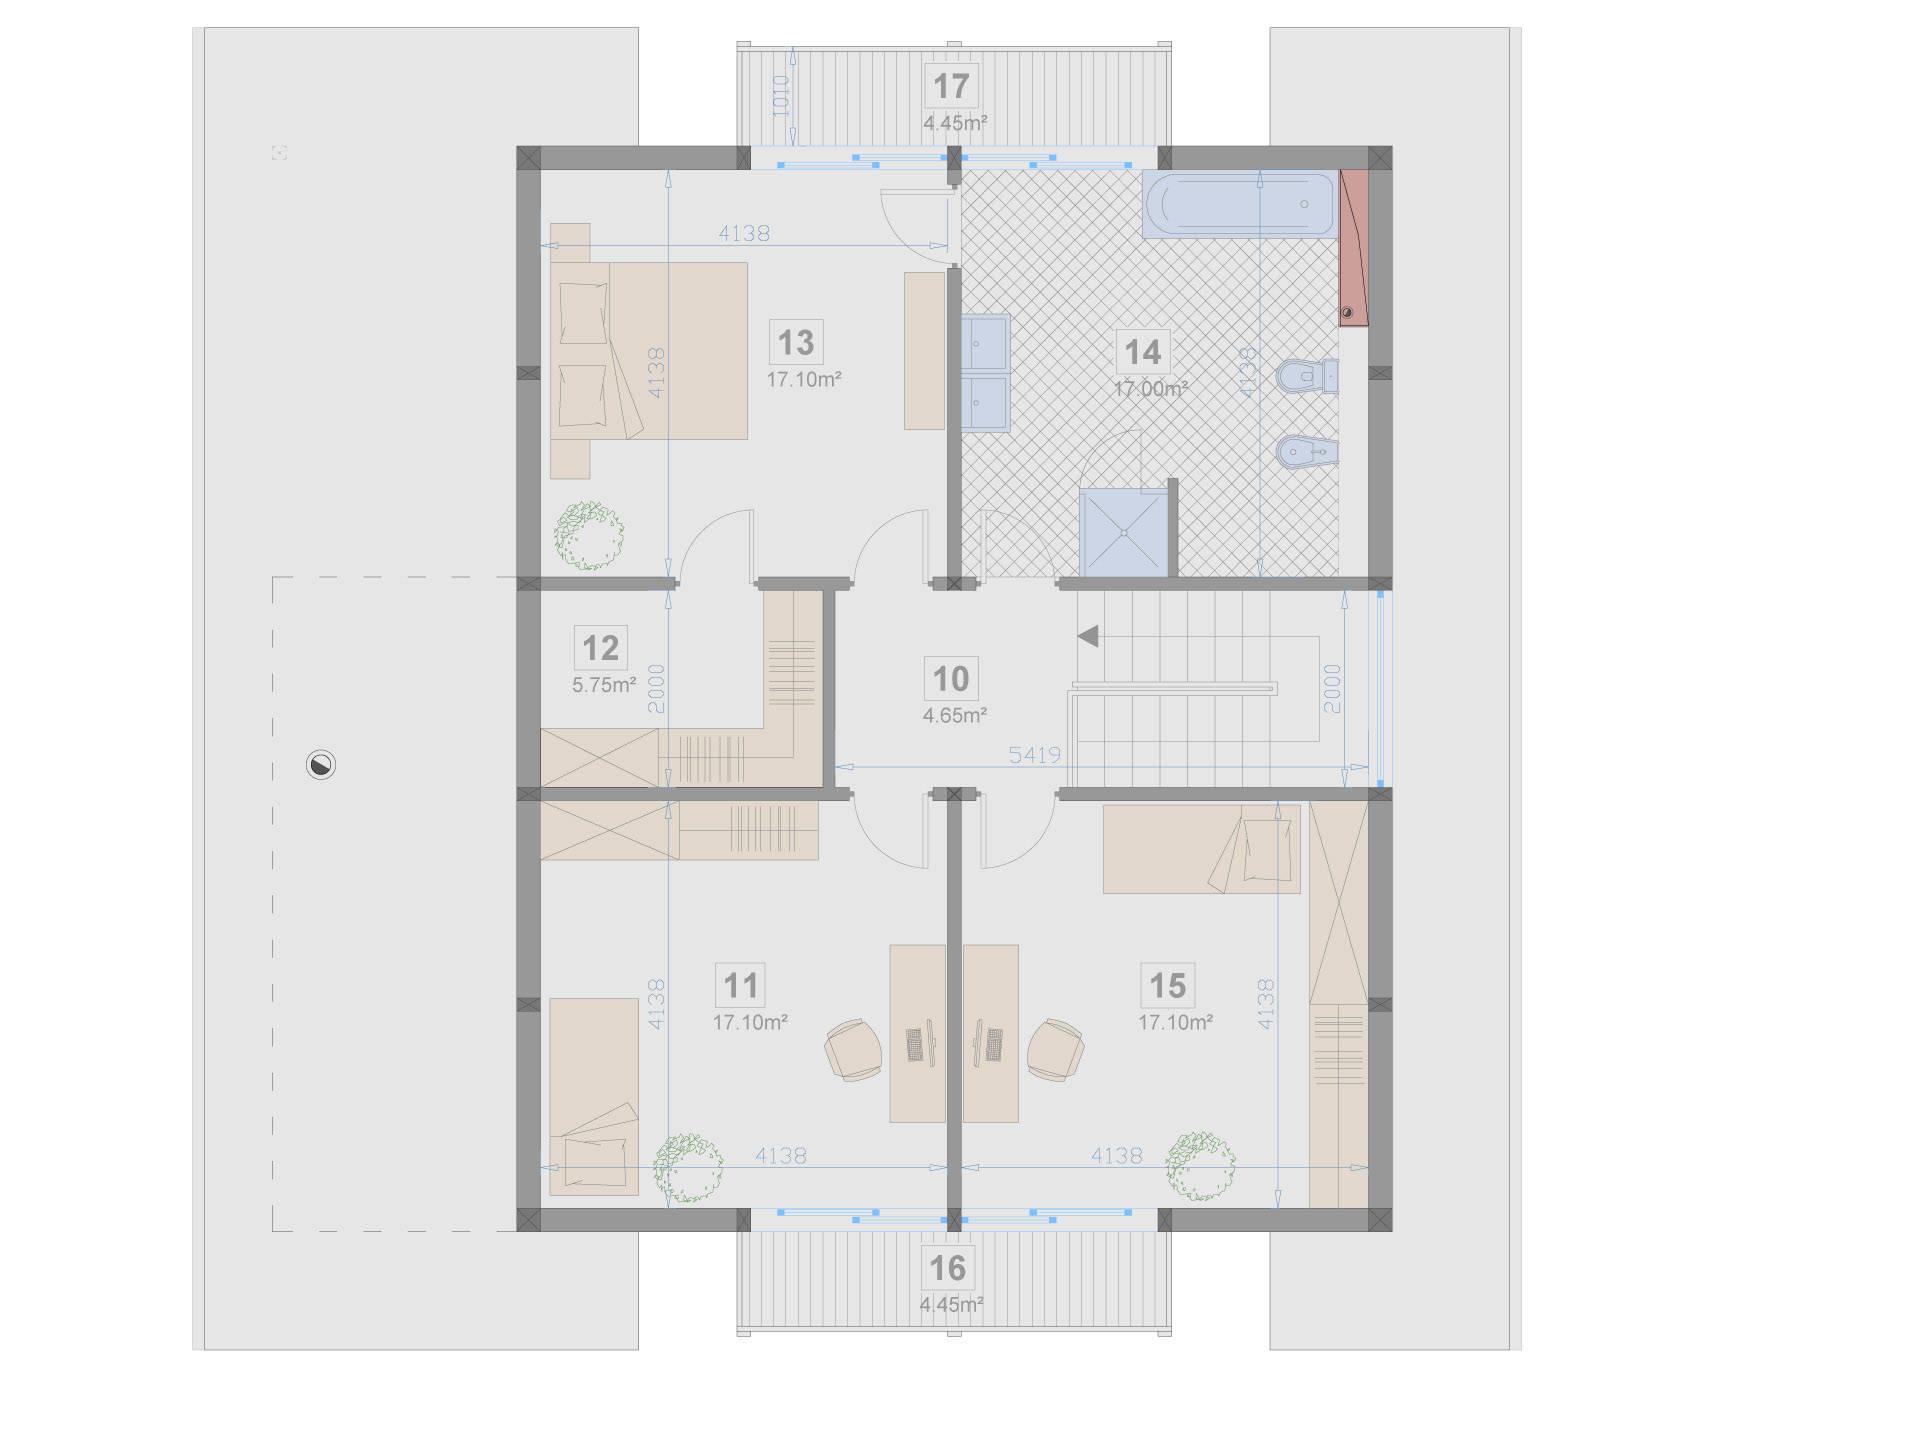 Familienhaus 180 von Designo Haus - Grundriss DG